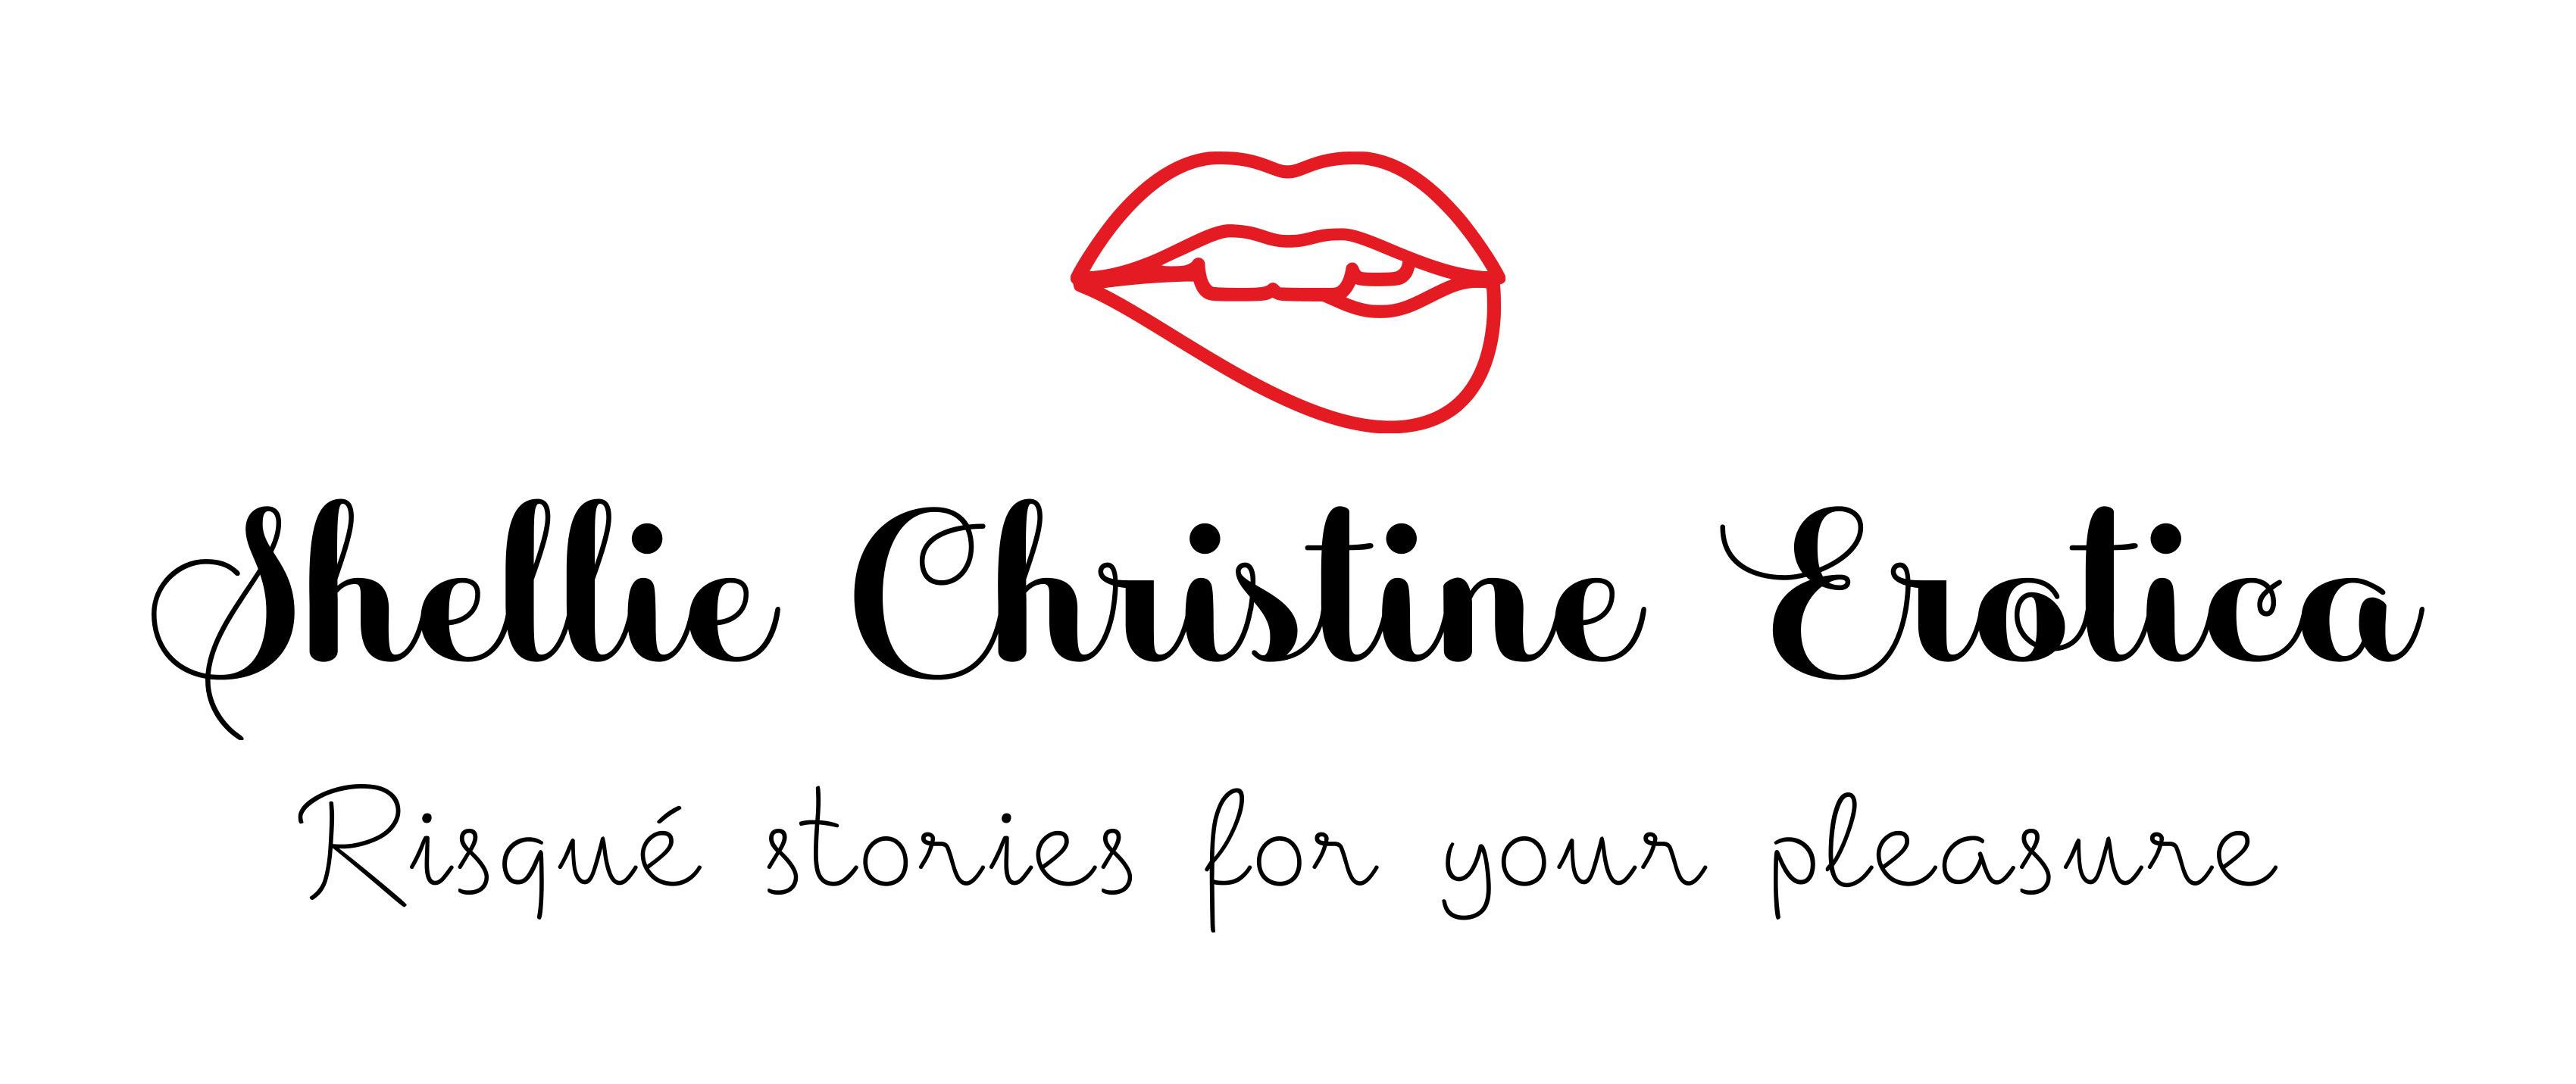 shellie christine erotica author risqué stories for your pleasure